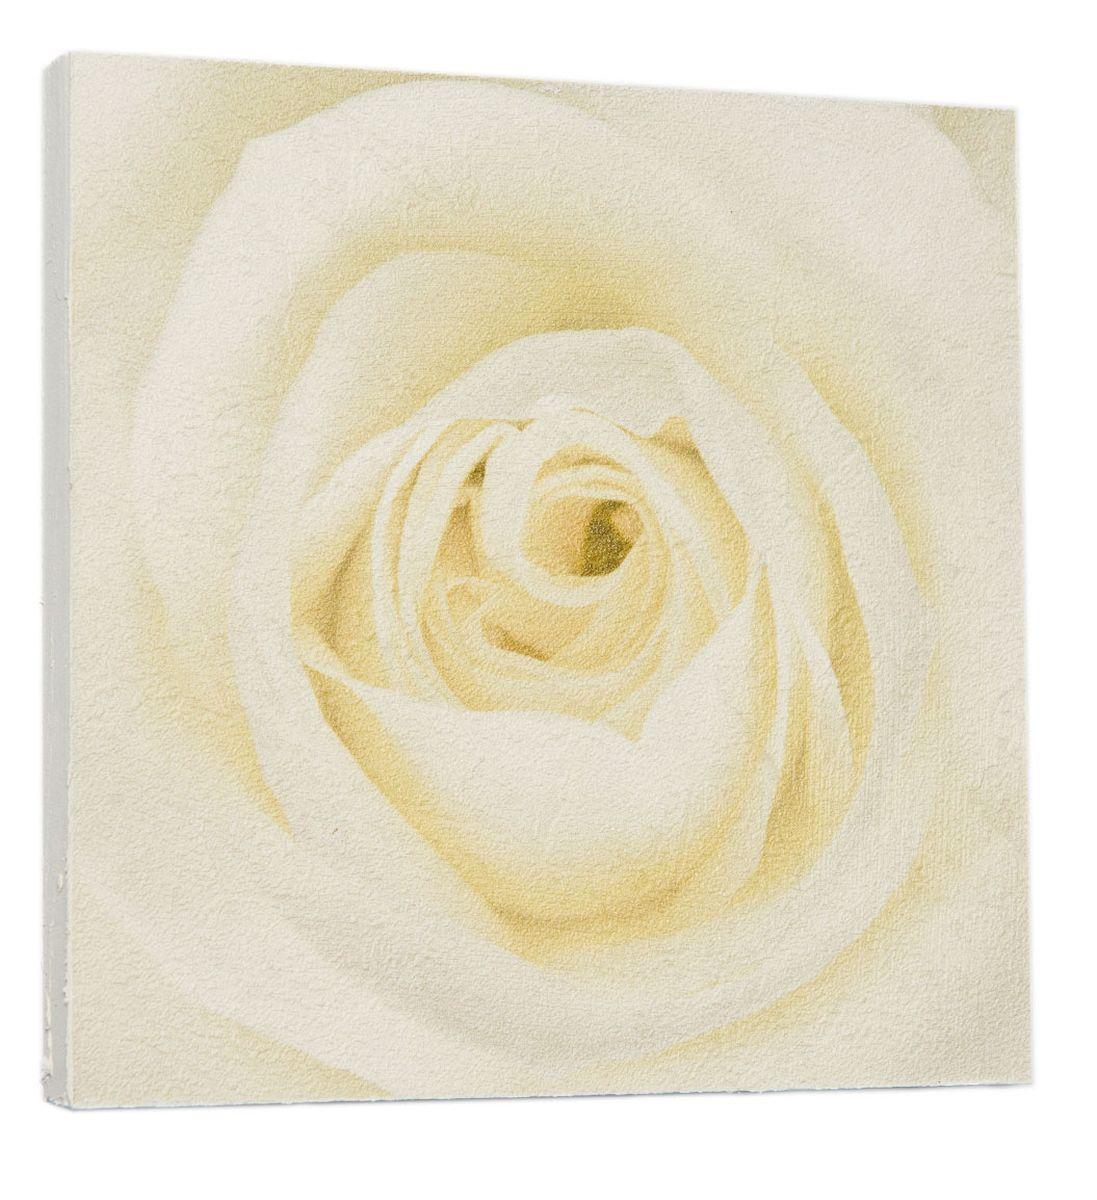 Картина Нежная кремовая роза, 22 х 22 см